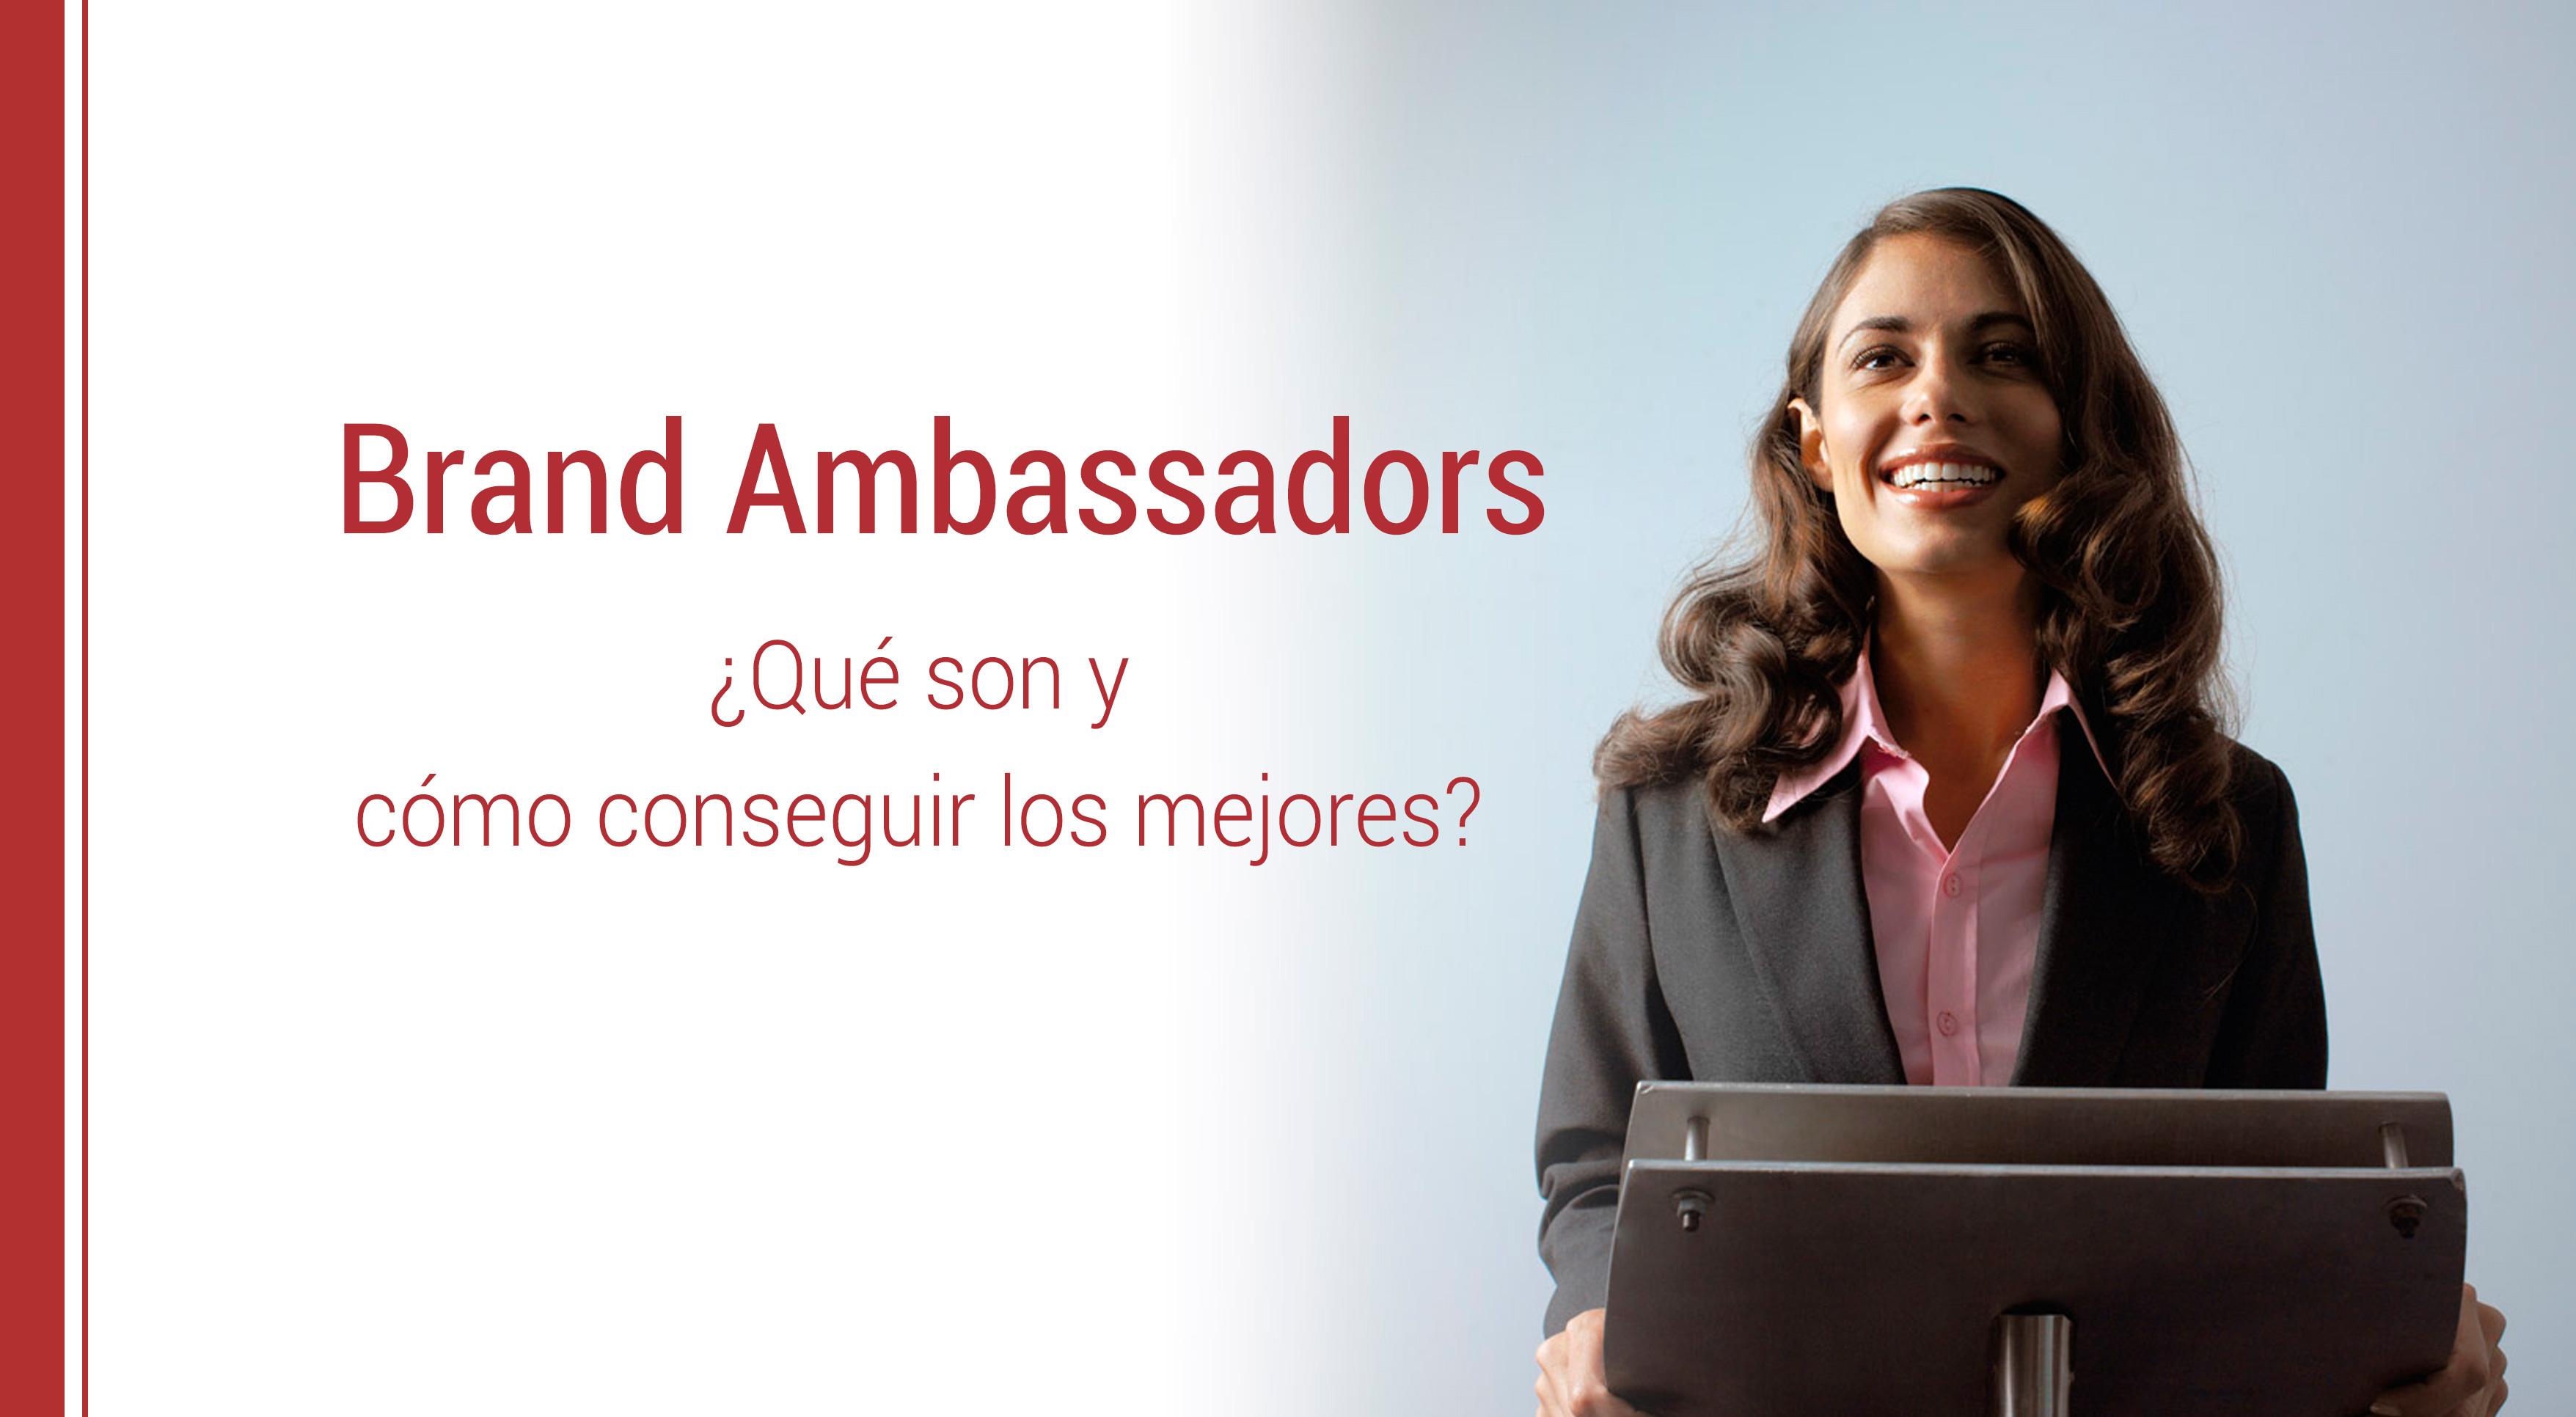 que son los brand ambassadors